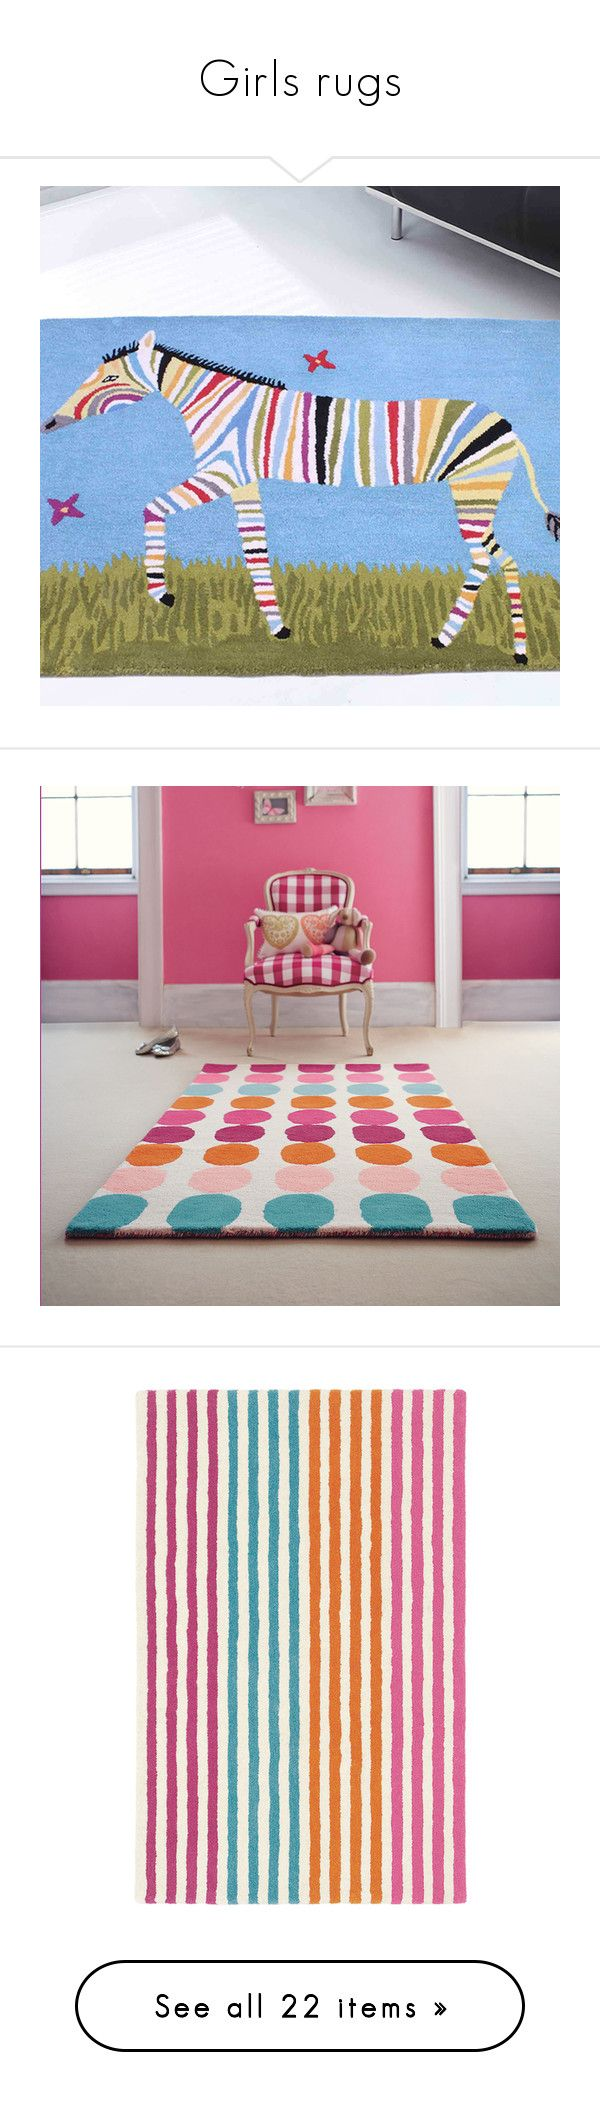 Kempton polyester area rug burgundy merlot colored 3 x3 area rugs - Kempton Polyester Area Rug Burgundy Merlot Colored 3 X3 Area Rugs Girls Rugs By Therugseller Download